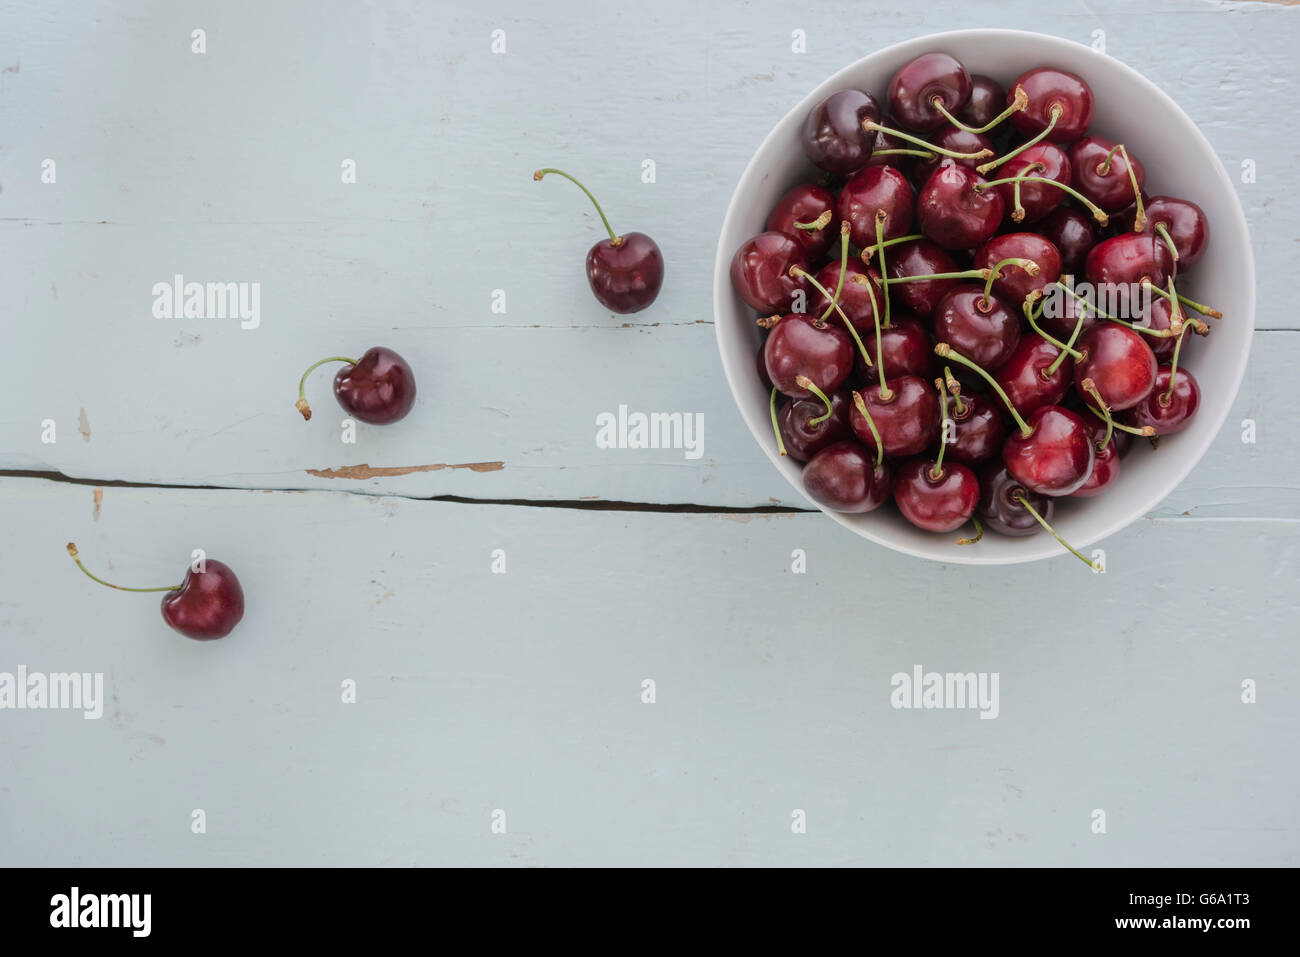 Cherries in white bowl. - Stock Image